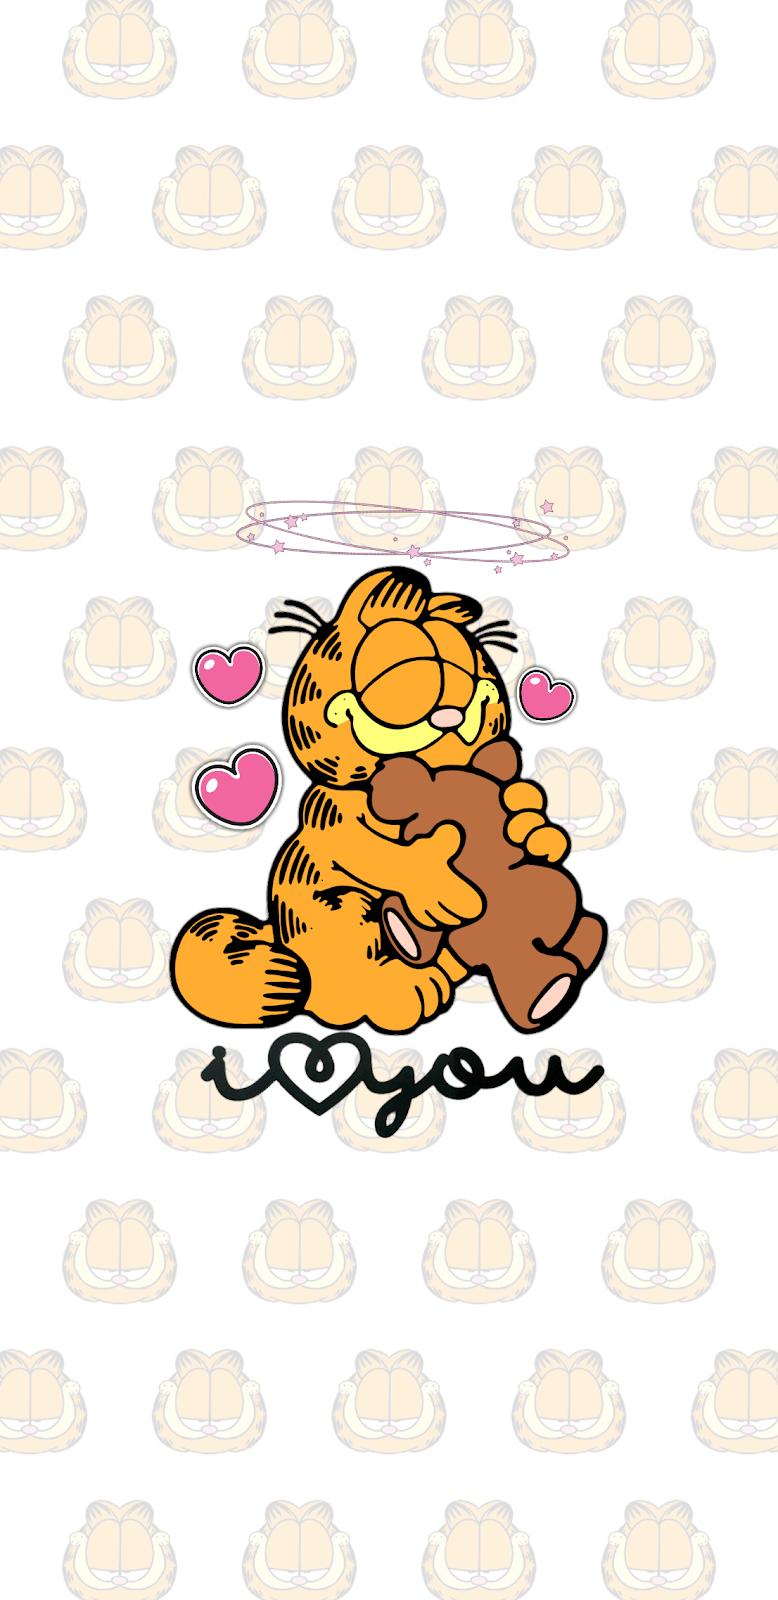 Garfield Wallpapers In 2020 Garfield Wallpaper Cartoon Wallpaper Iphone Phone Wallpaper